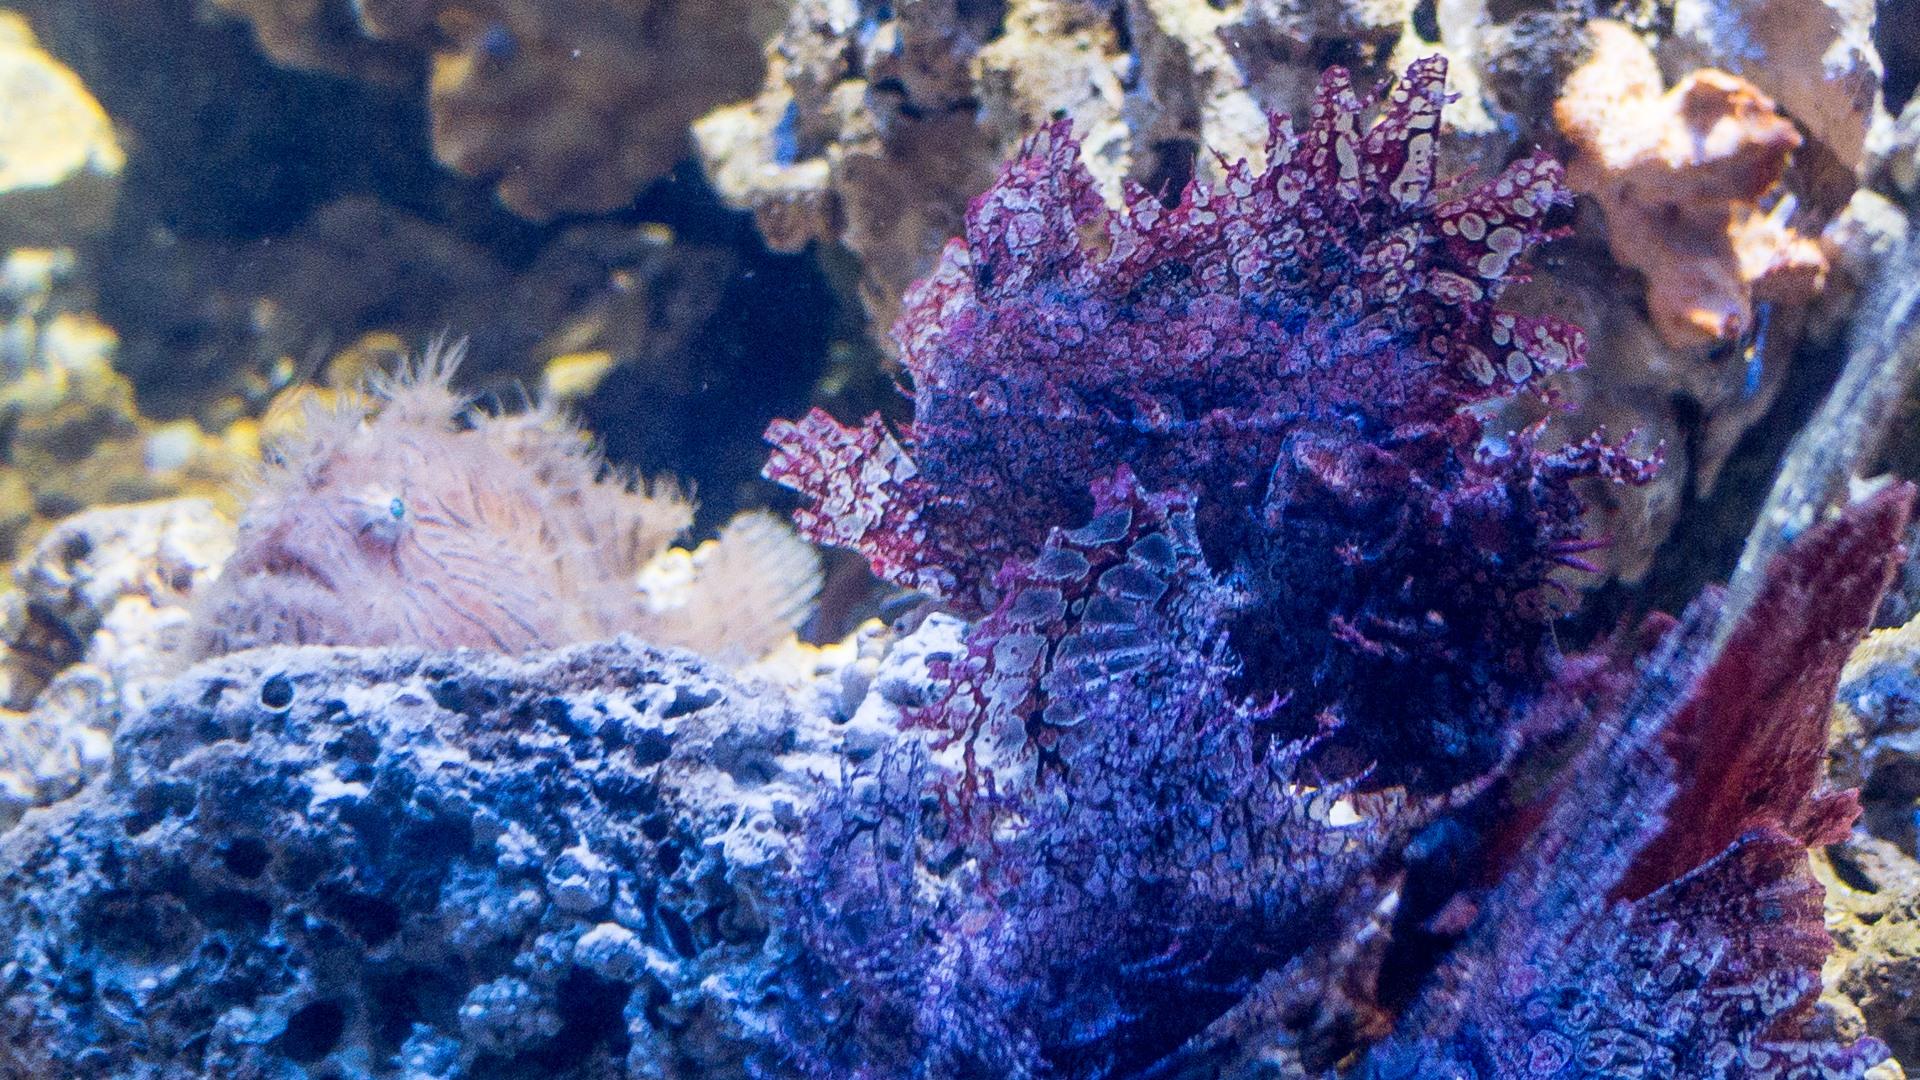 Таитийская бородавчатая рыба-клоун и худосочная скорпена, Striated Frogfish & Weedy Scorpionfish (Antennarius striatus, Rhinopias frondosa), S.E.A. Aquarium